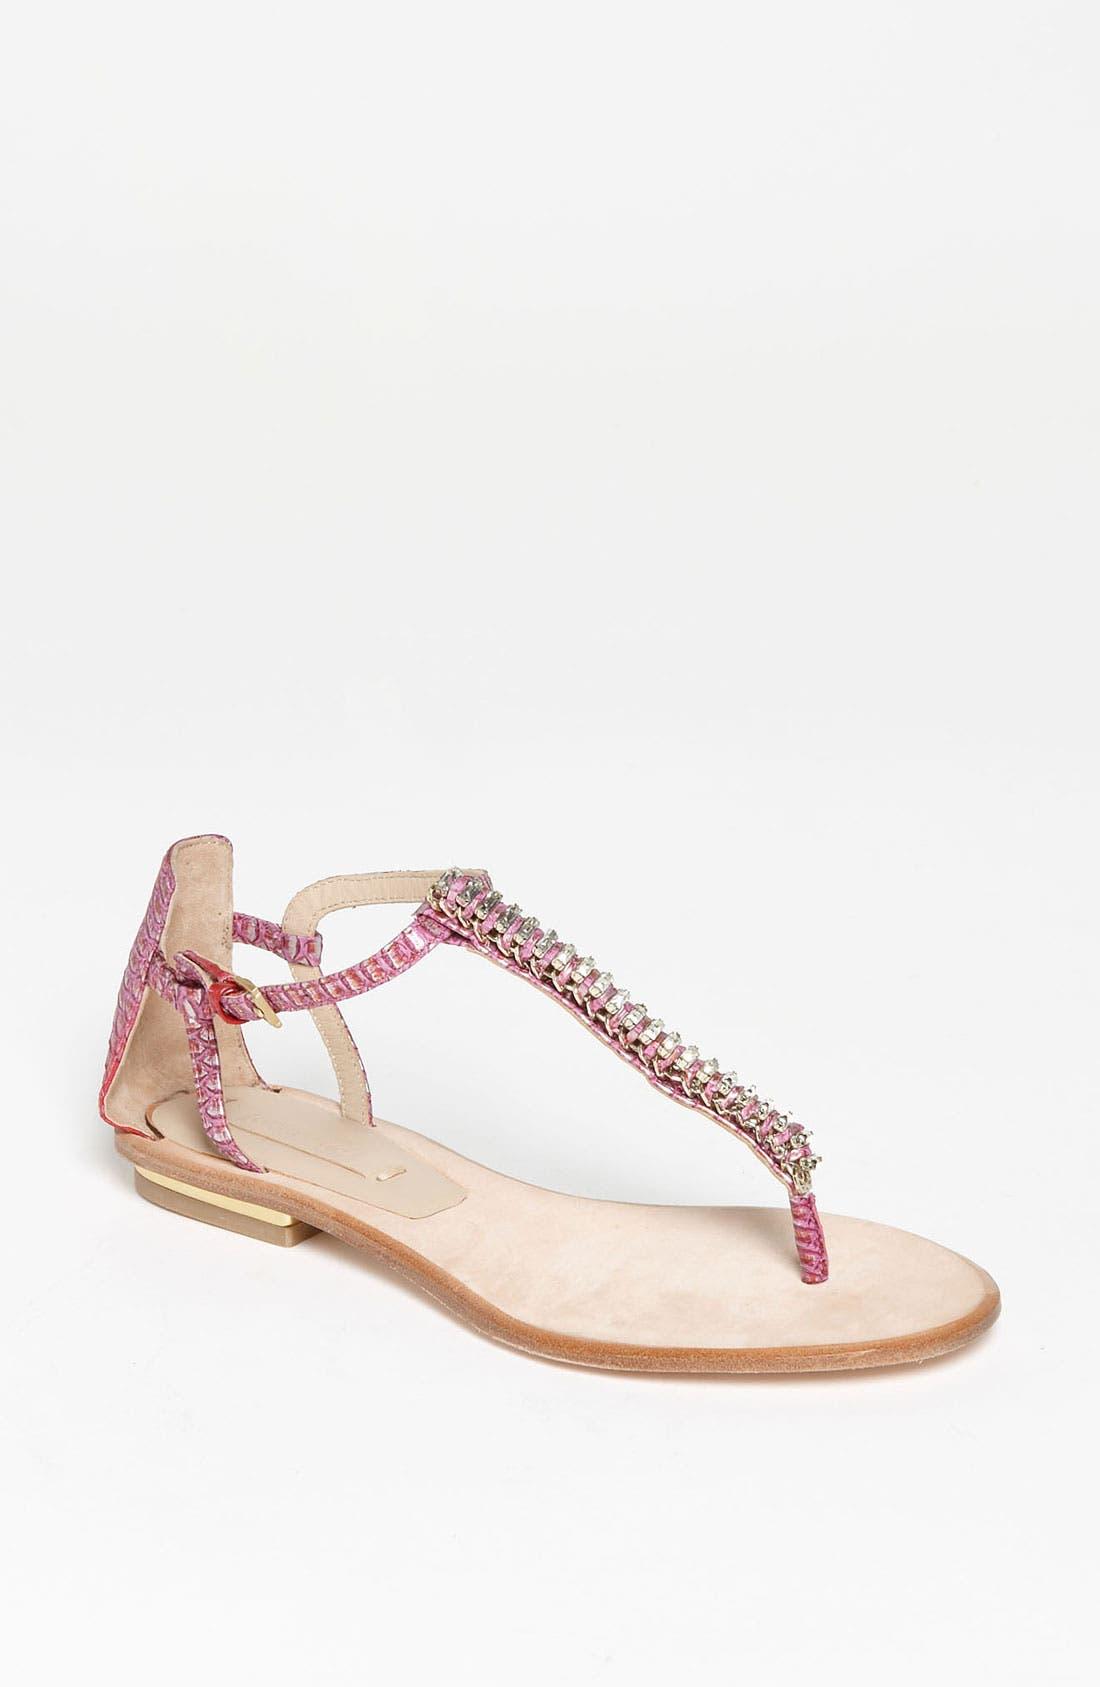 Alternate Image 1 Selected - Rachel Roy 'Carina' Sandal